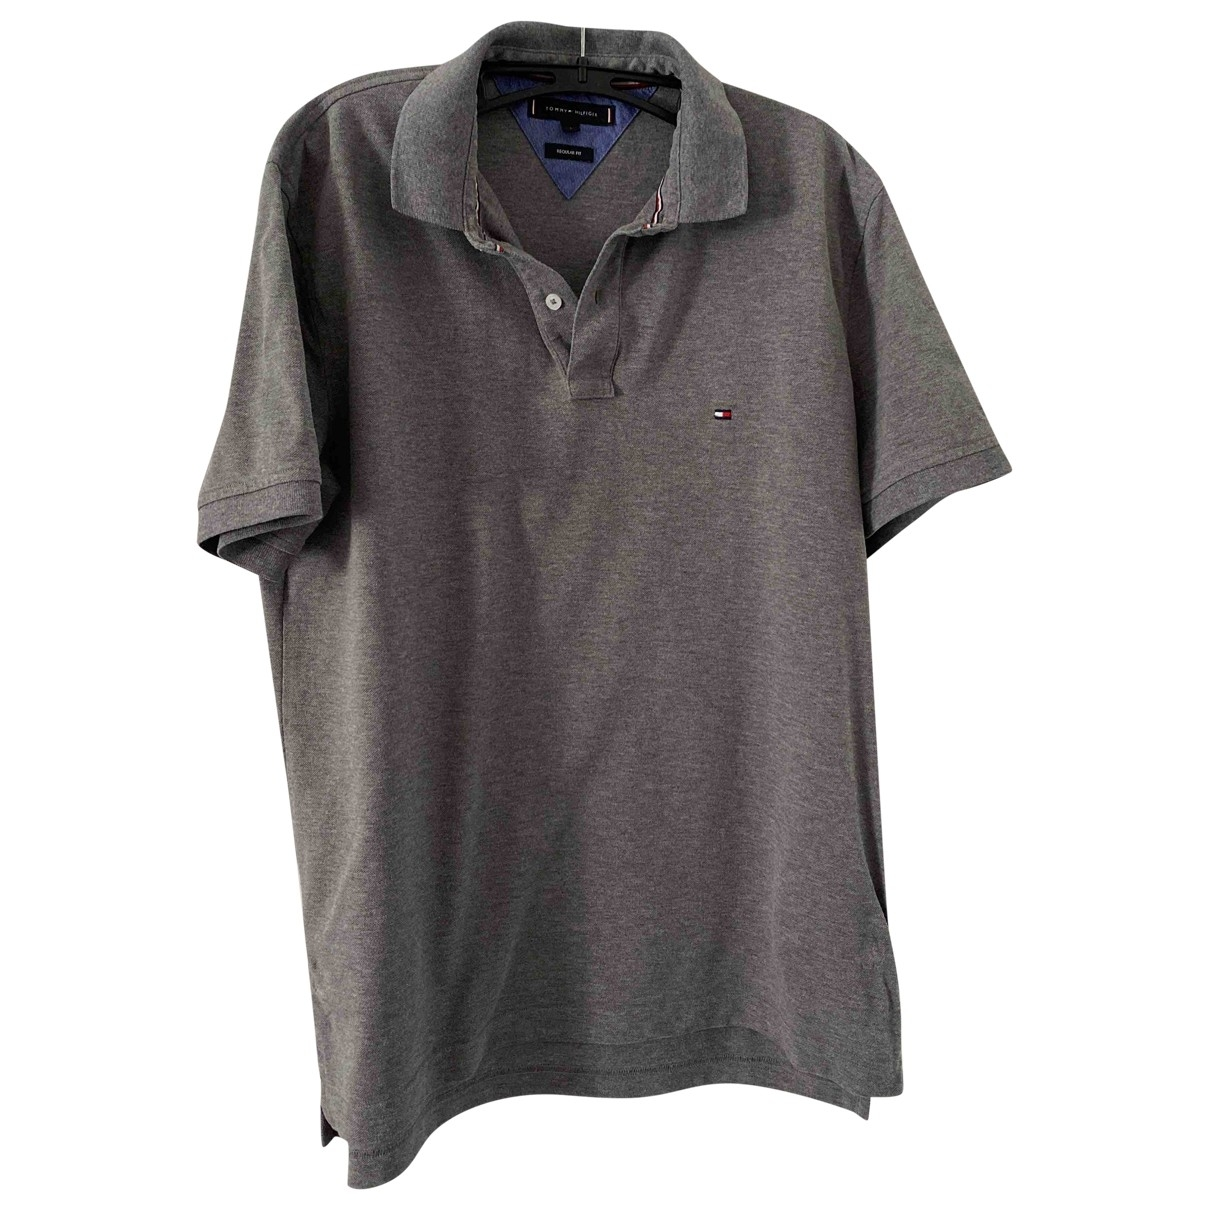 Tommy Hilfiger \N Grey Cotton Polo shirts for Men L International